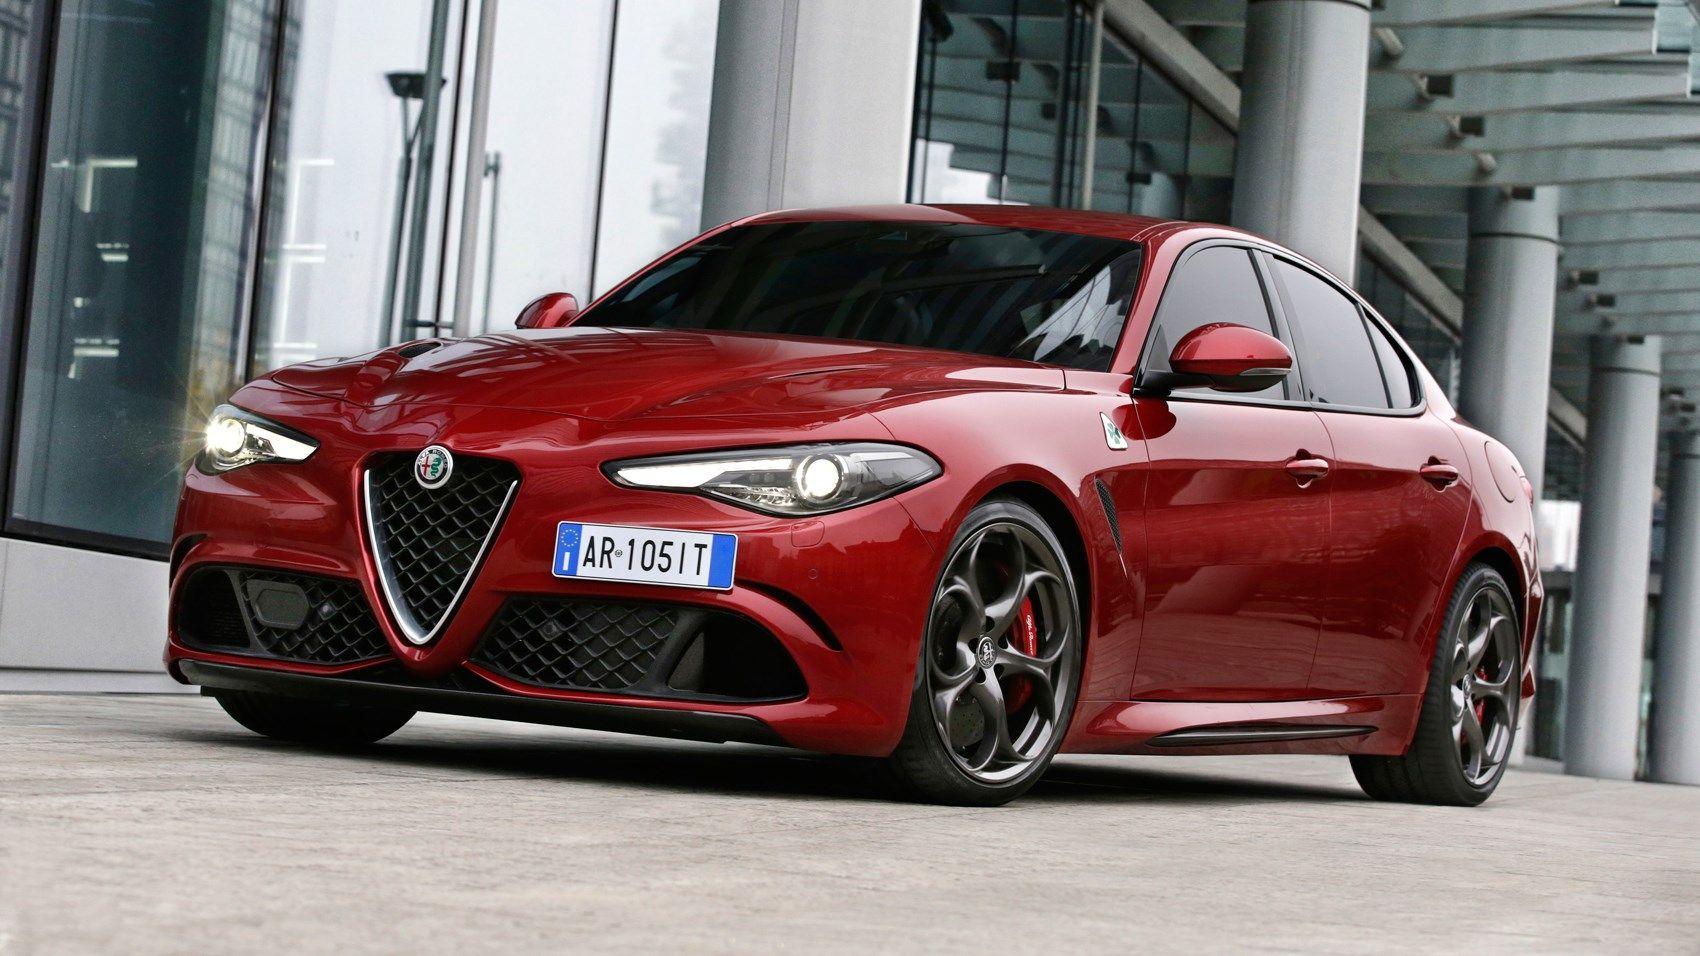 Alfa Romeo Giulia Quadrifoglio 2019 Review Racing Version Driven Alfas Ruedas De Coche Autos